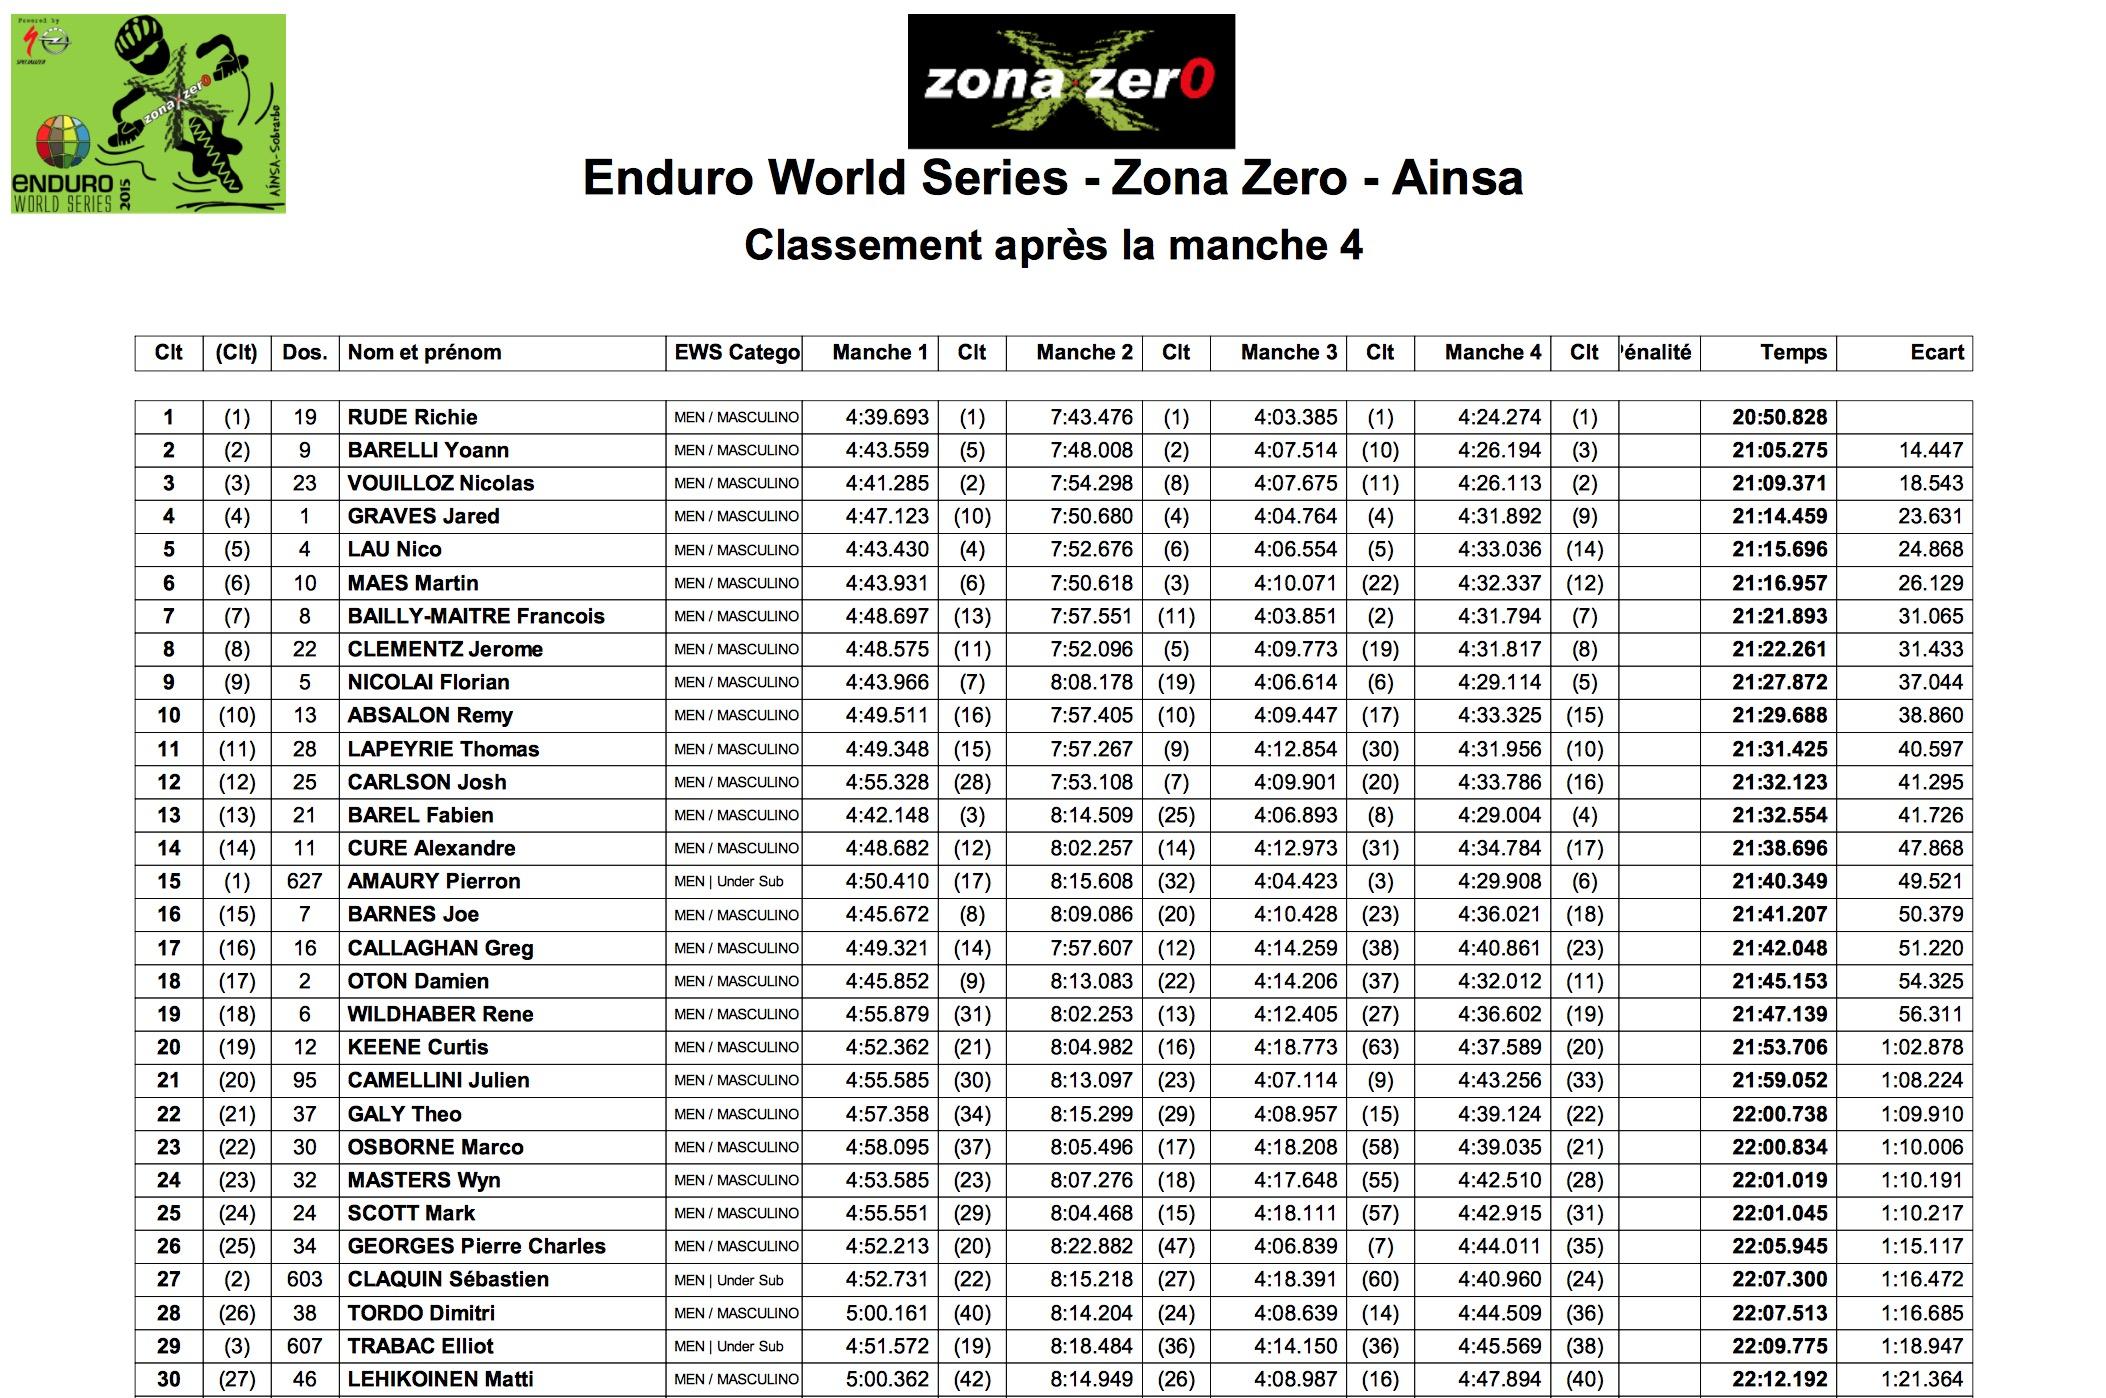 ews2015_zonazero_classement j1